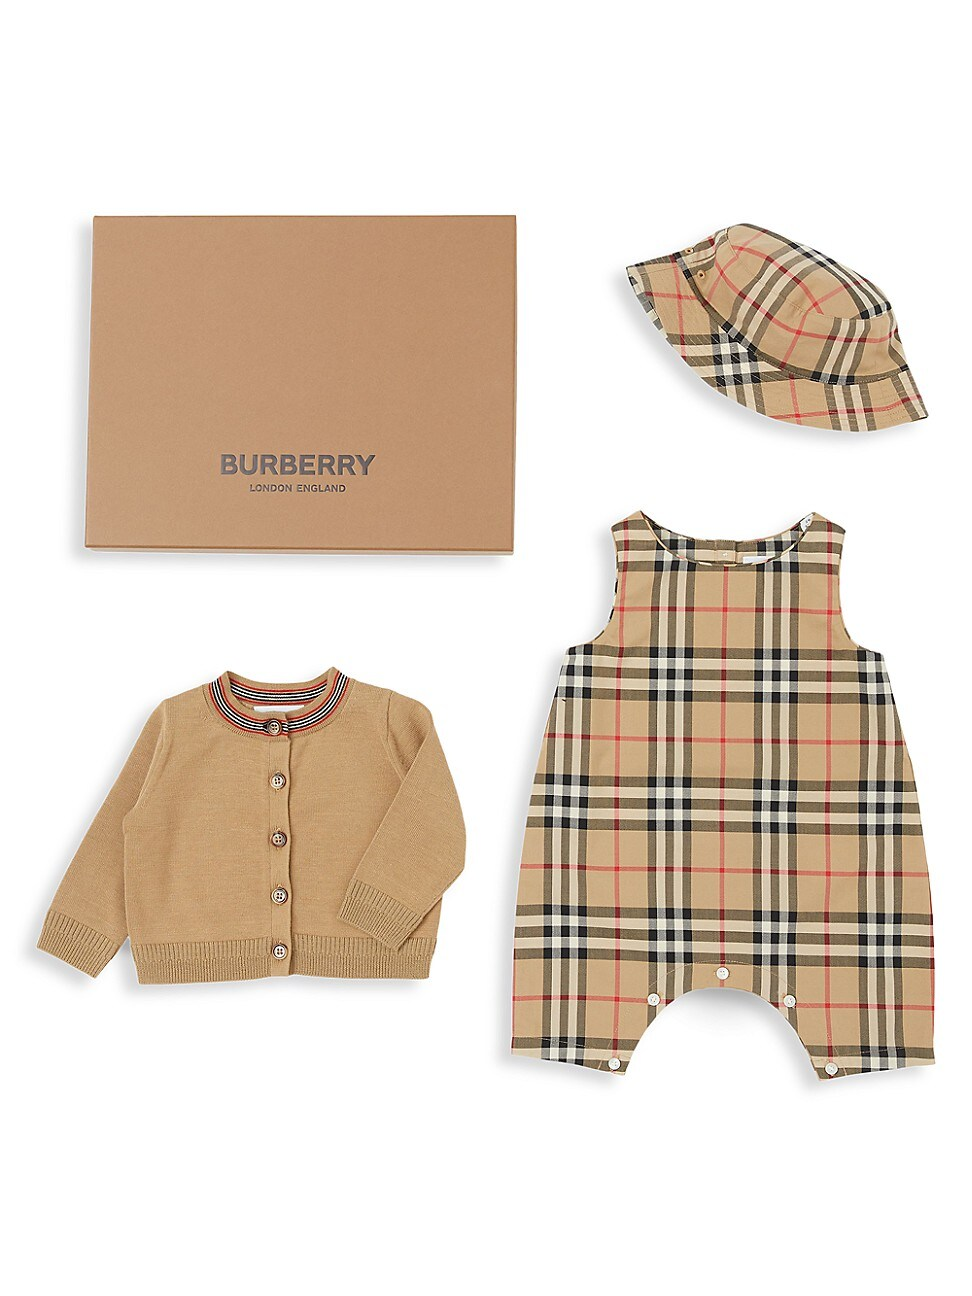 Burberry BABY'S 3-PIECE BODYSUIT, CARDIGAN, & HAT GIFT SET